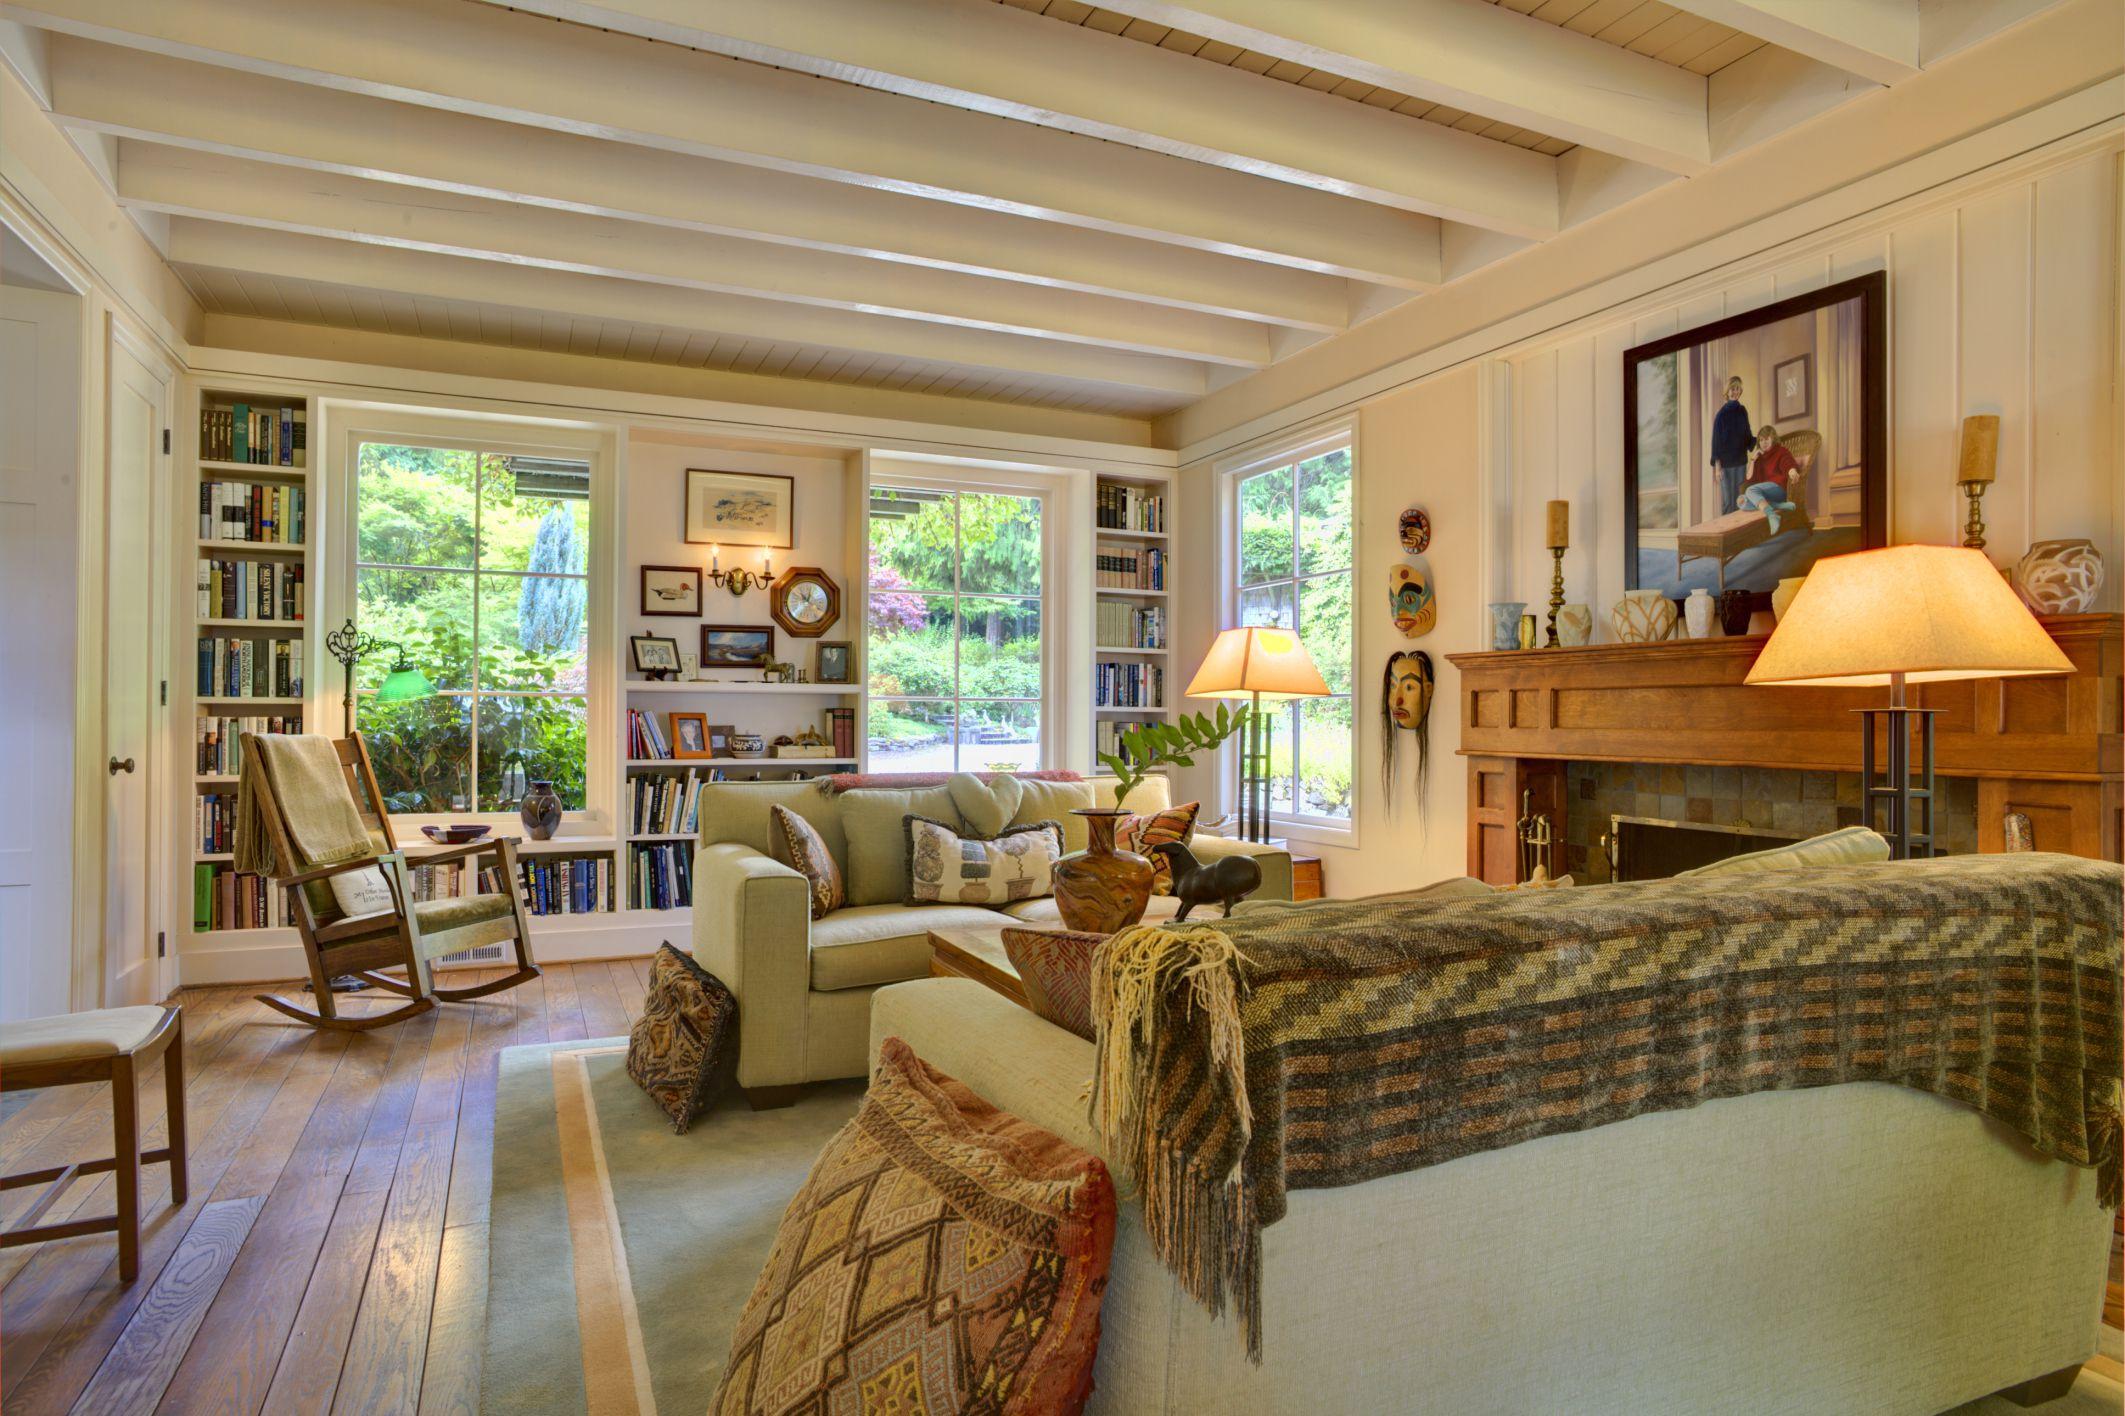 Room Arranging: 8 Furniture Arranging Mistakes